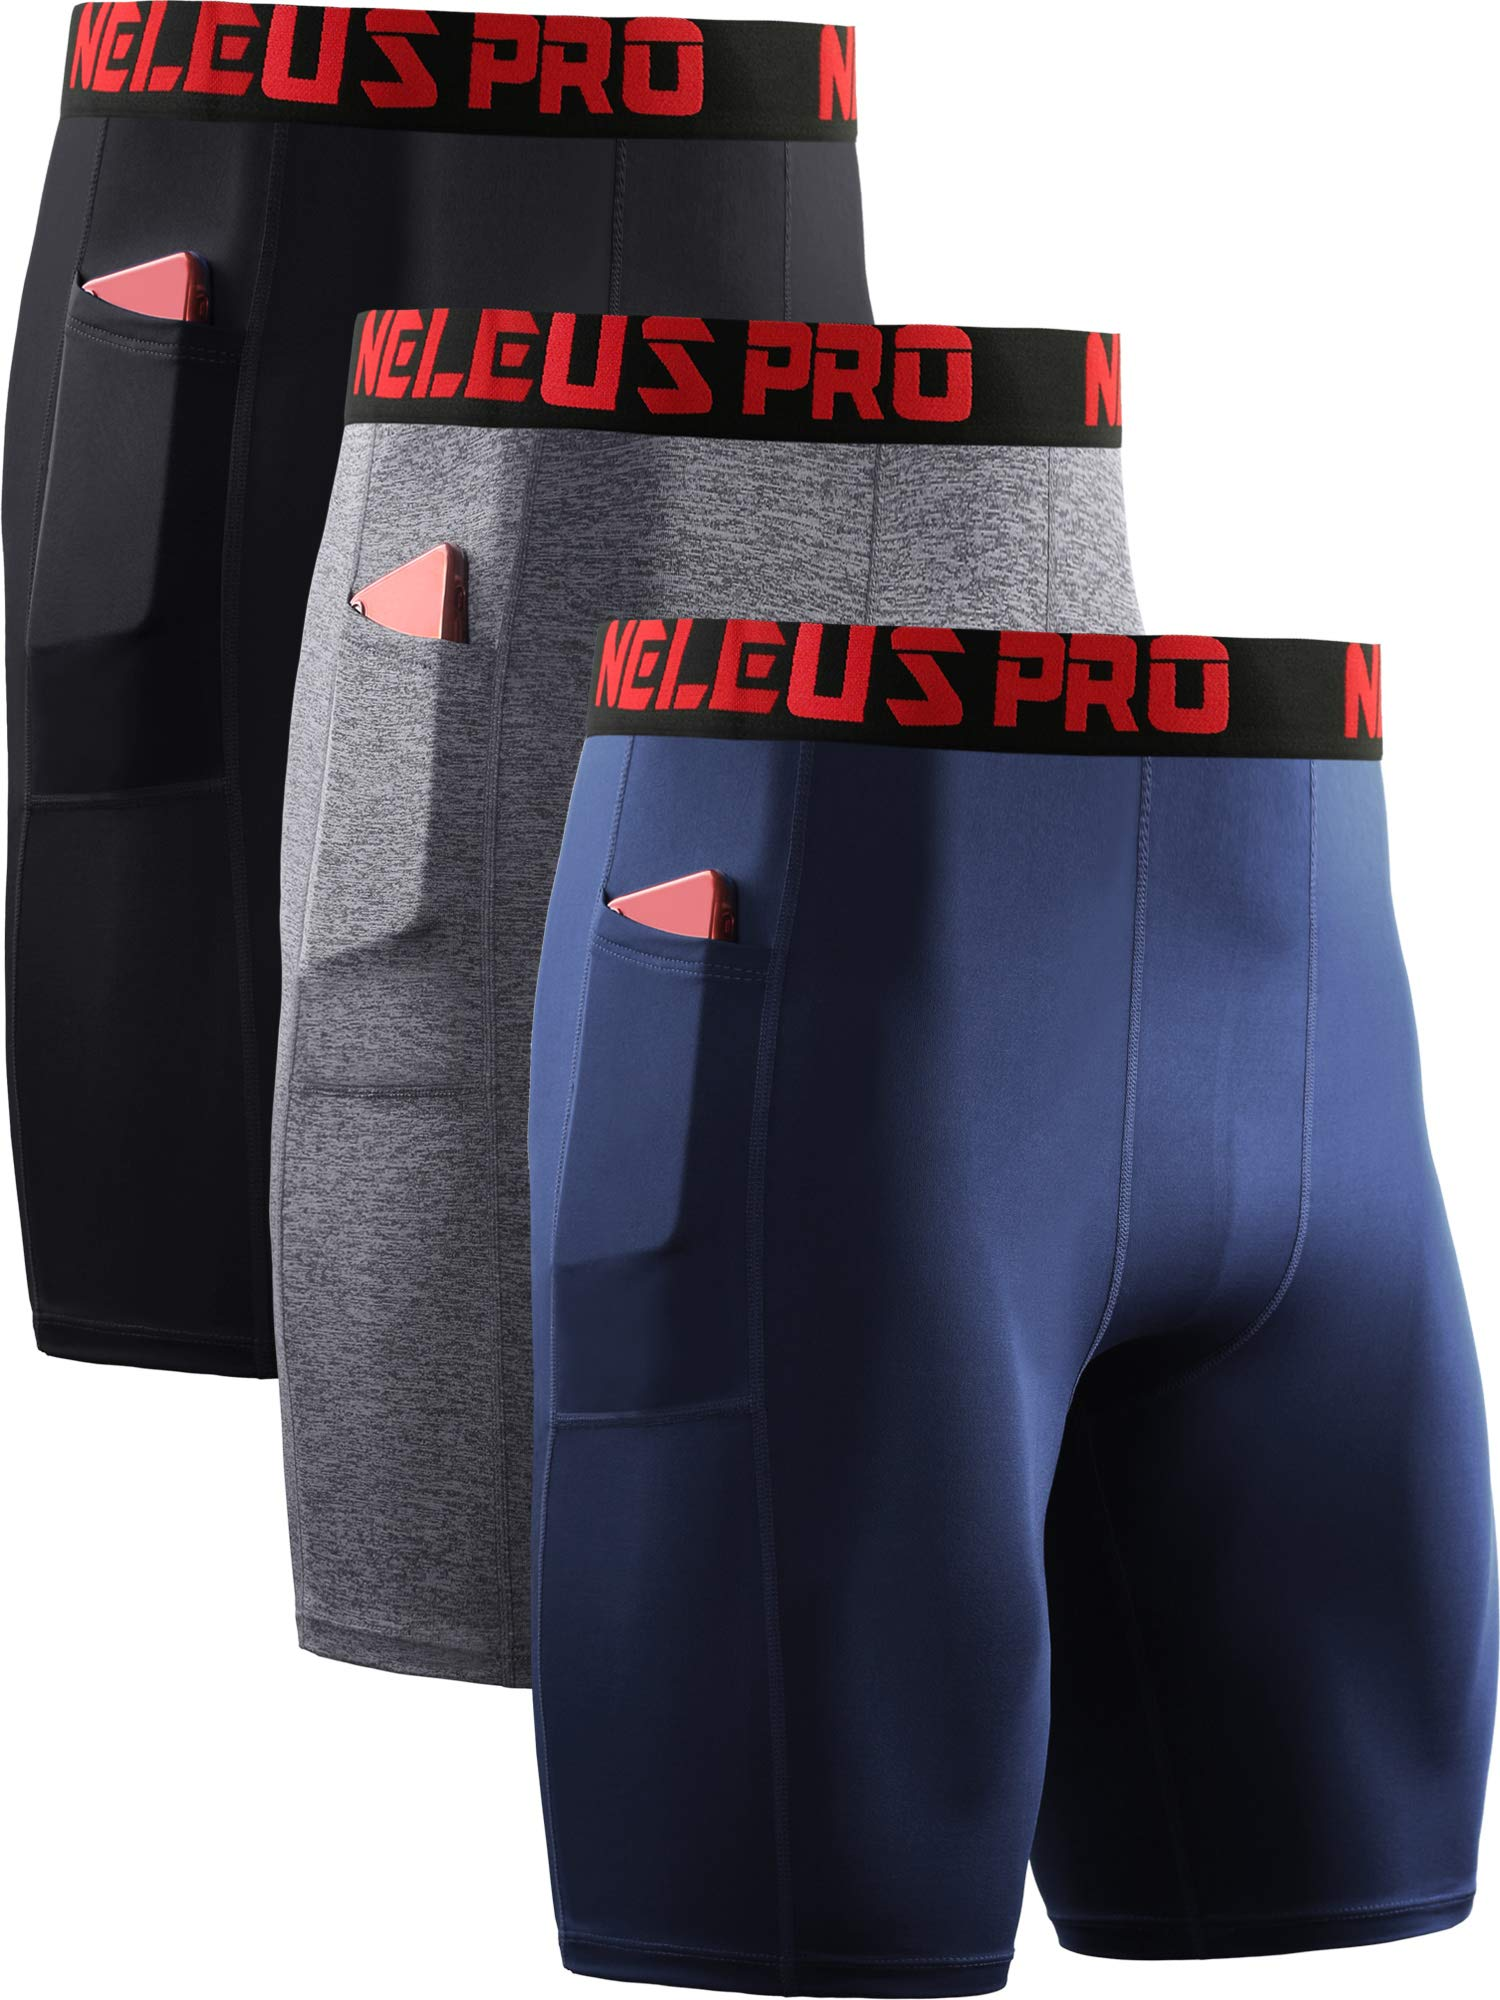 Neleus Men's Compression Shorts with Pockets 3 Pack,6064,Black/Grey/Navy Blue,US L,EU XL by Neleus